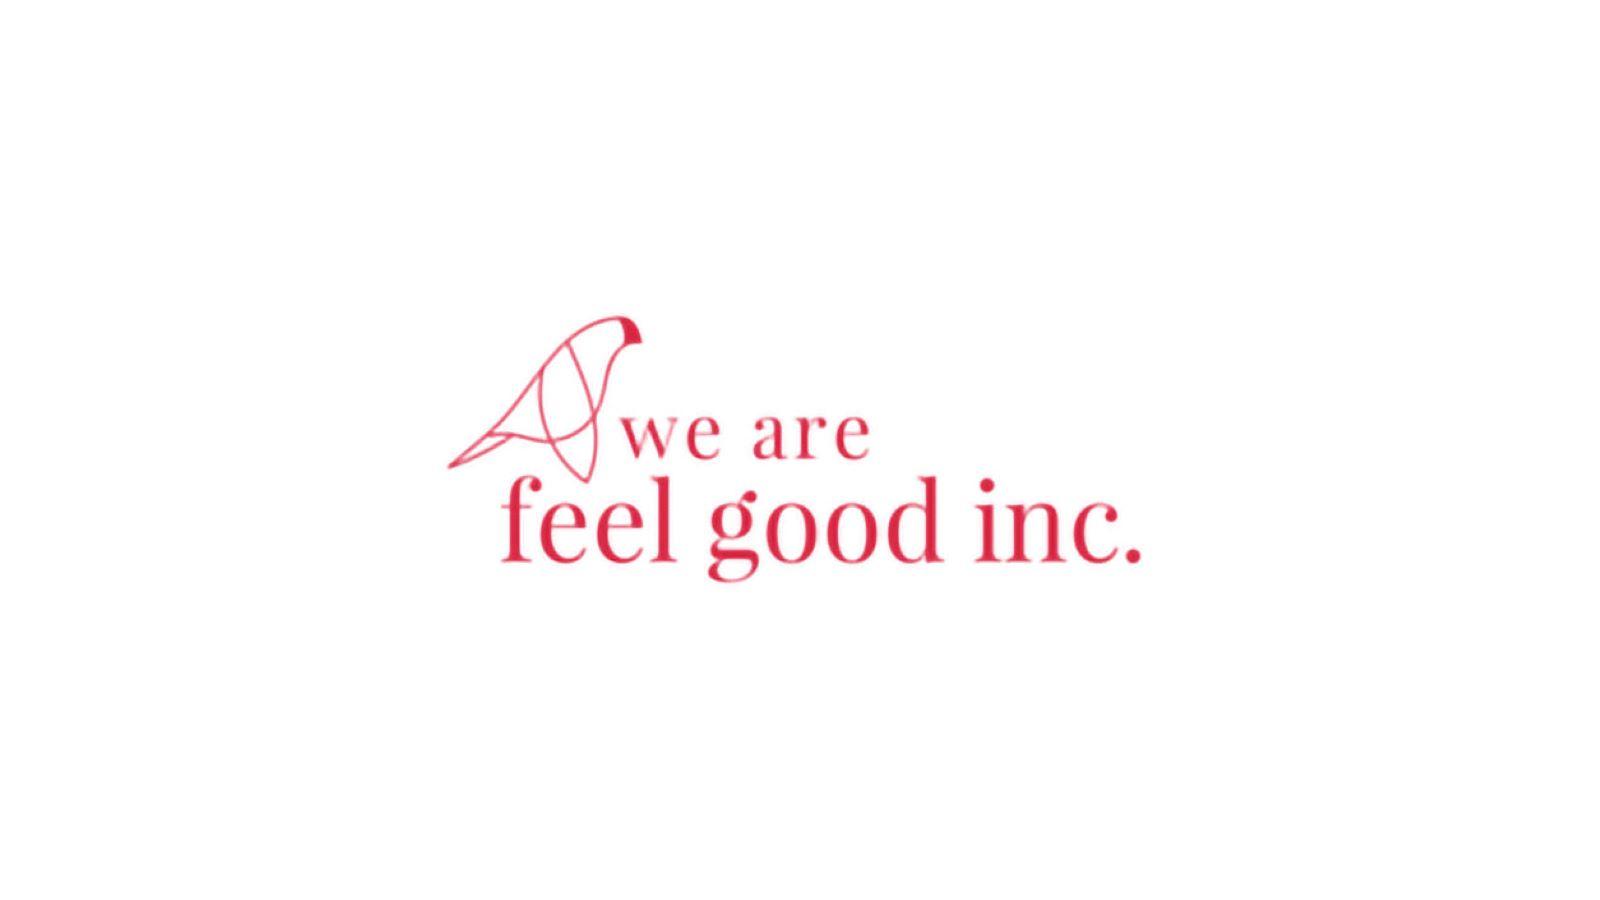 We are feel good logo